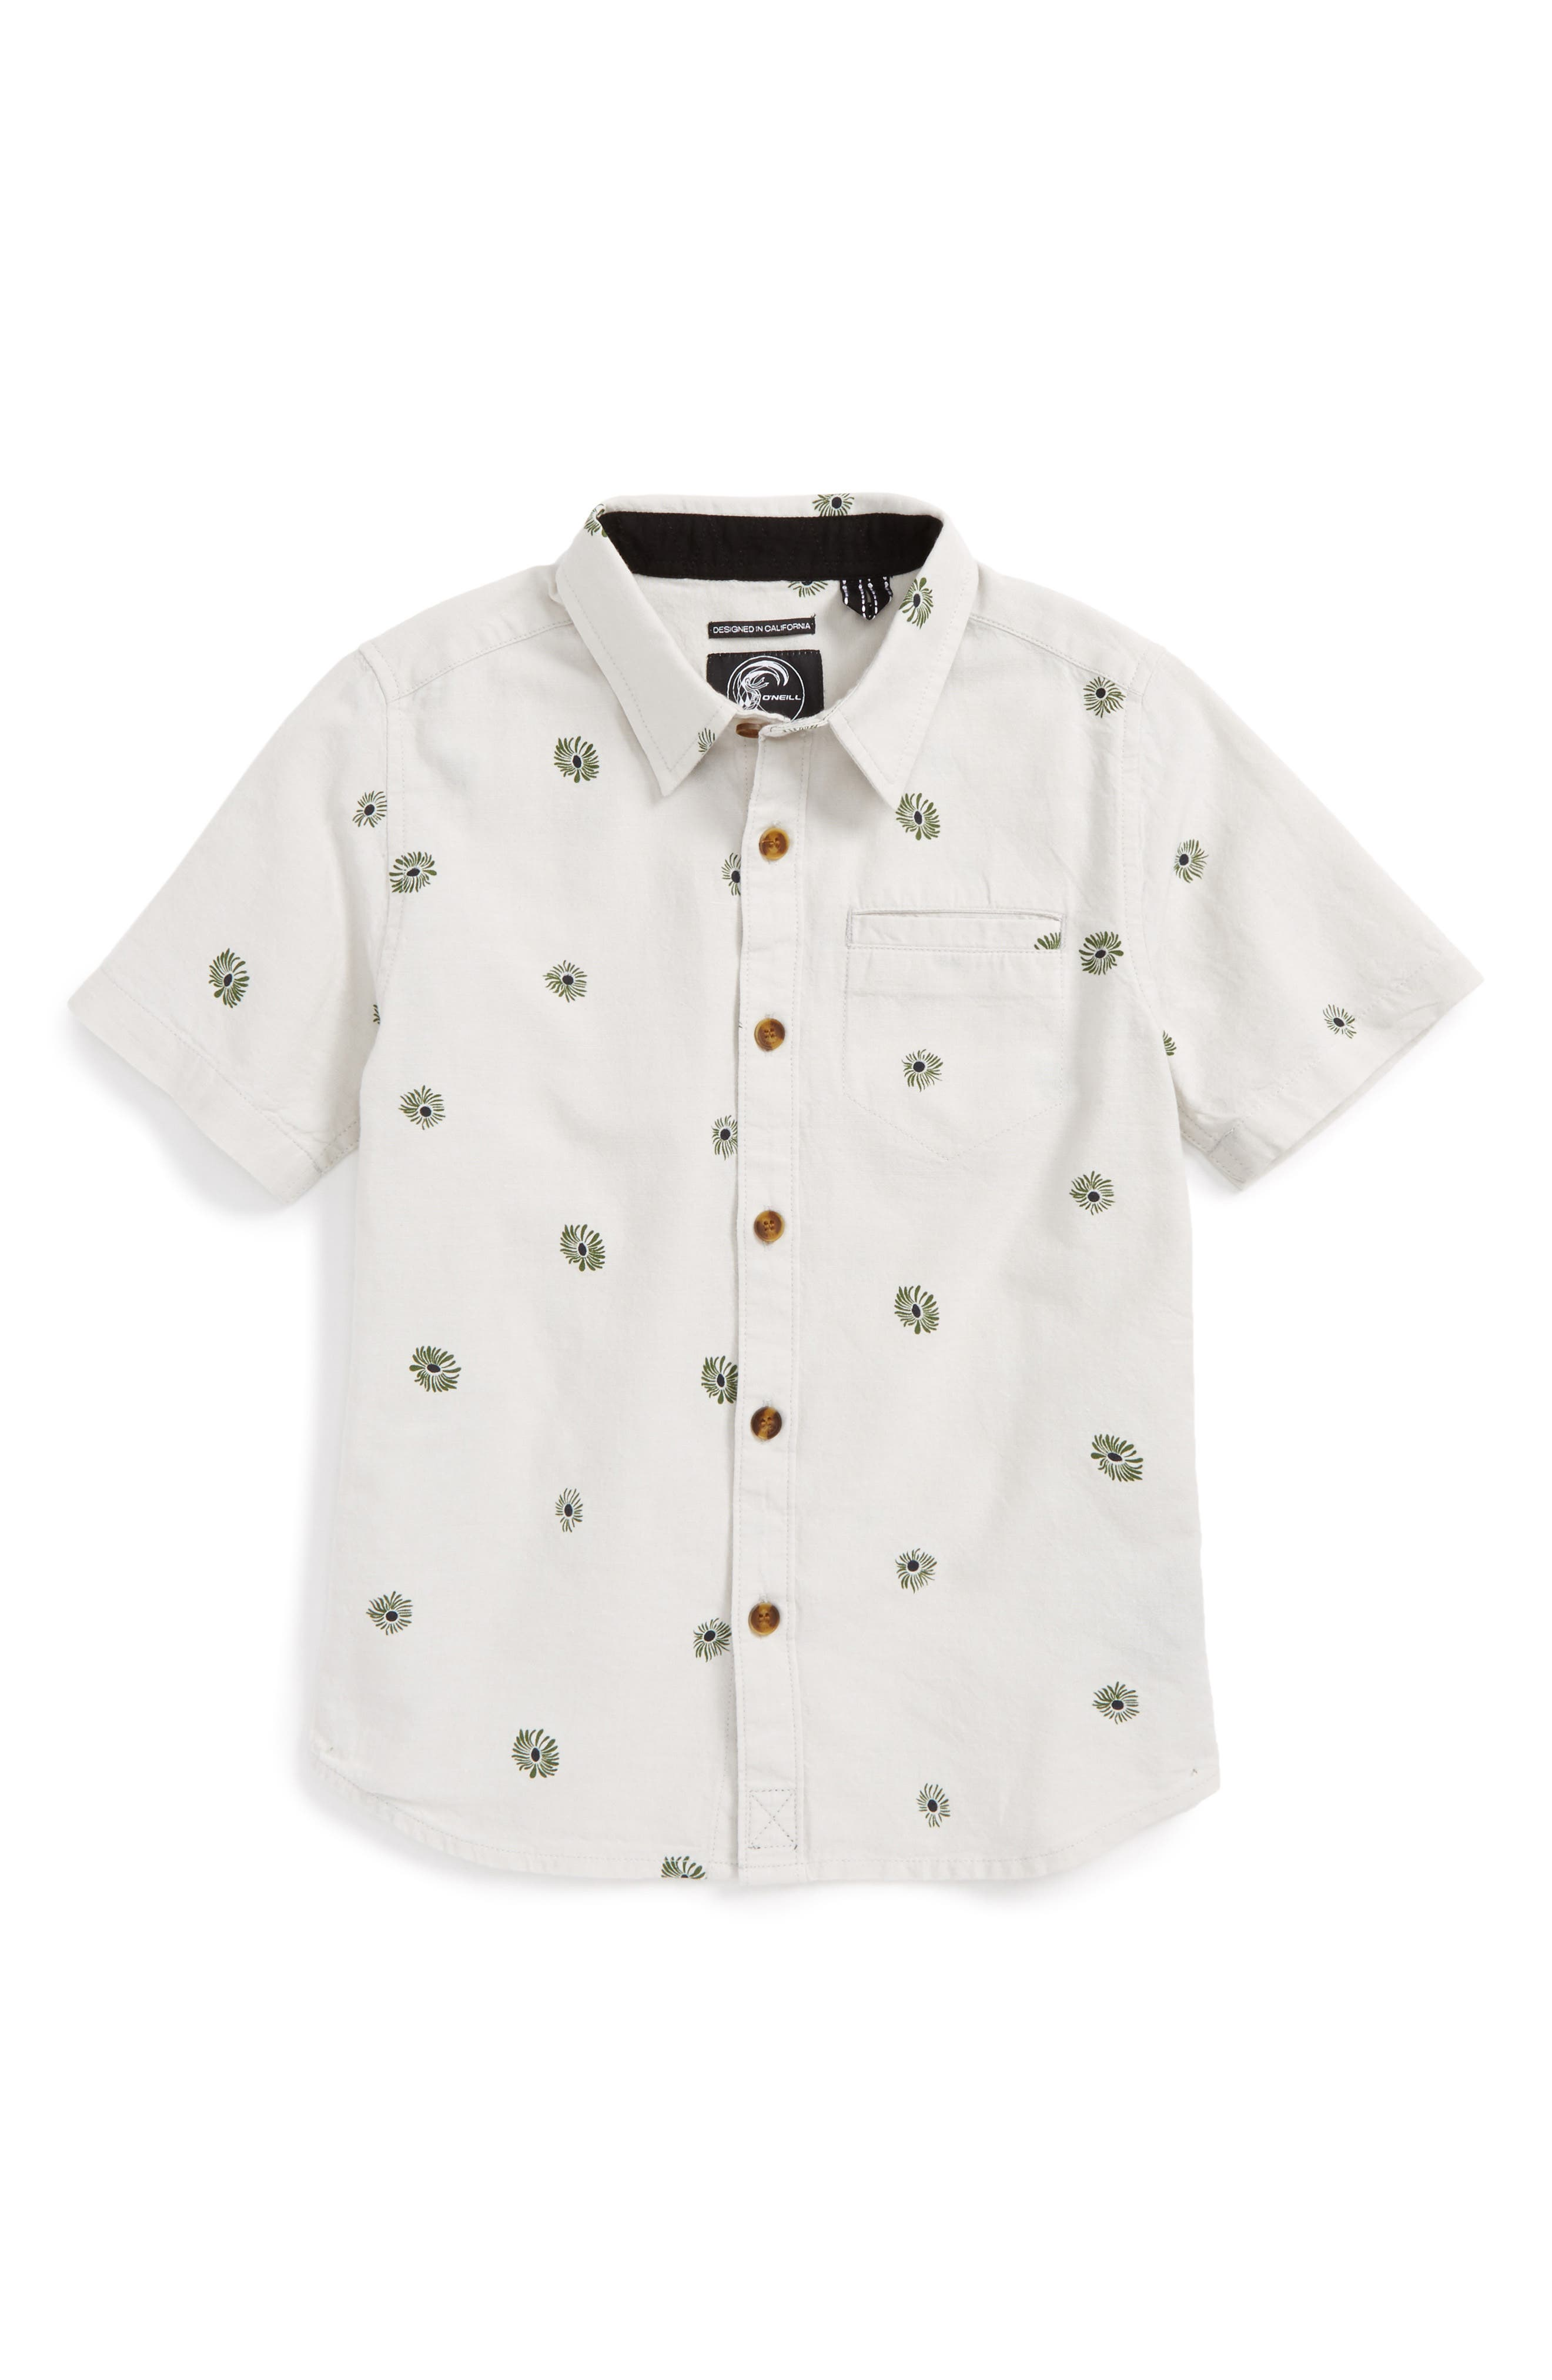 Alternate Image 1 Selected - O'Neill Brees Short Sleeve Woven Shirt (Little Boys)